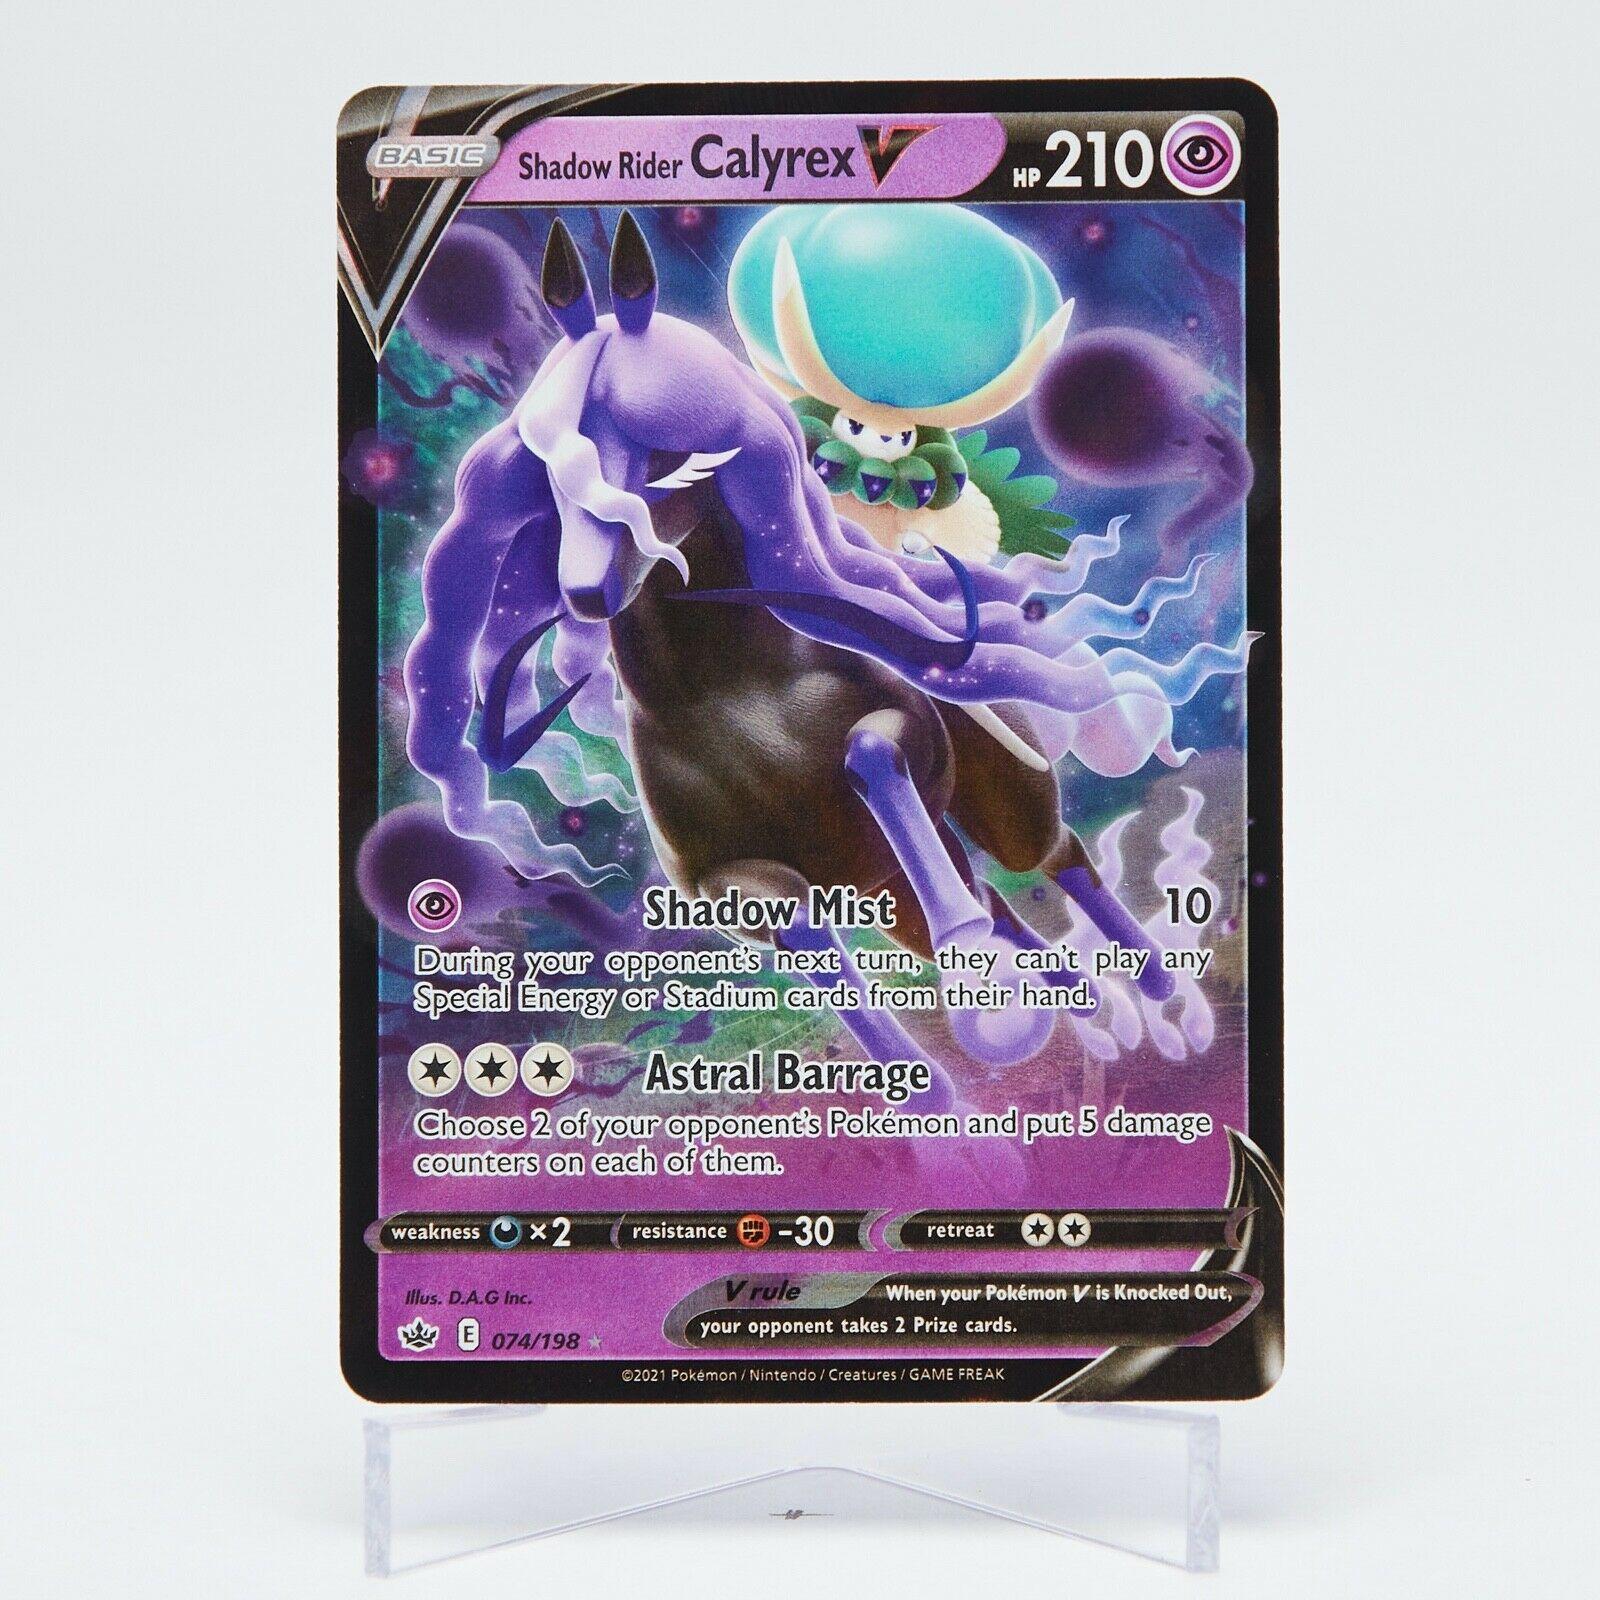 Shadow Rider Calyrex V 074/198 Chilling Reign Ultra Rare M/NM